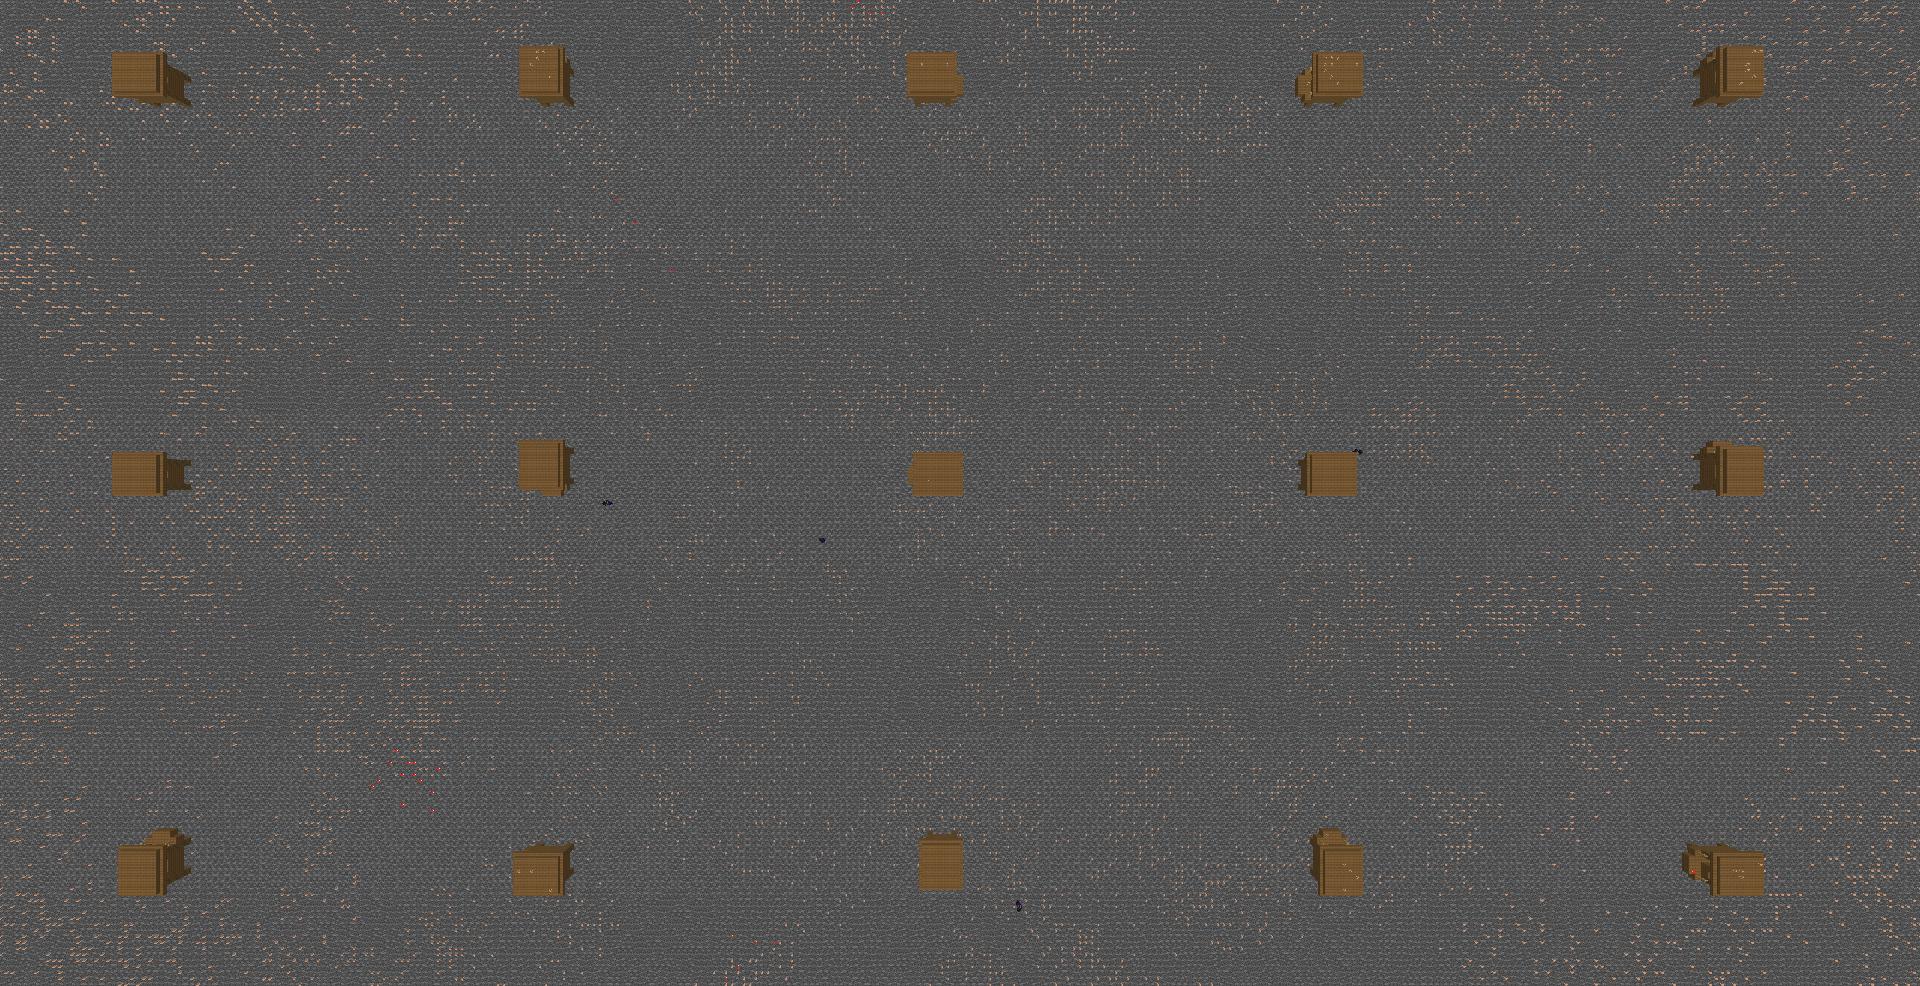 separation_3_spacing_4